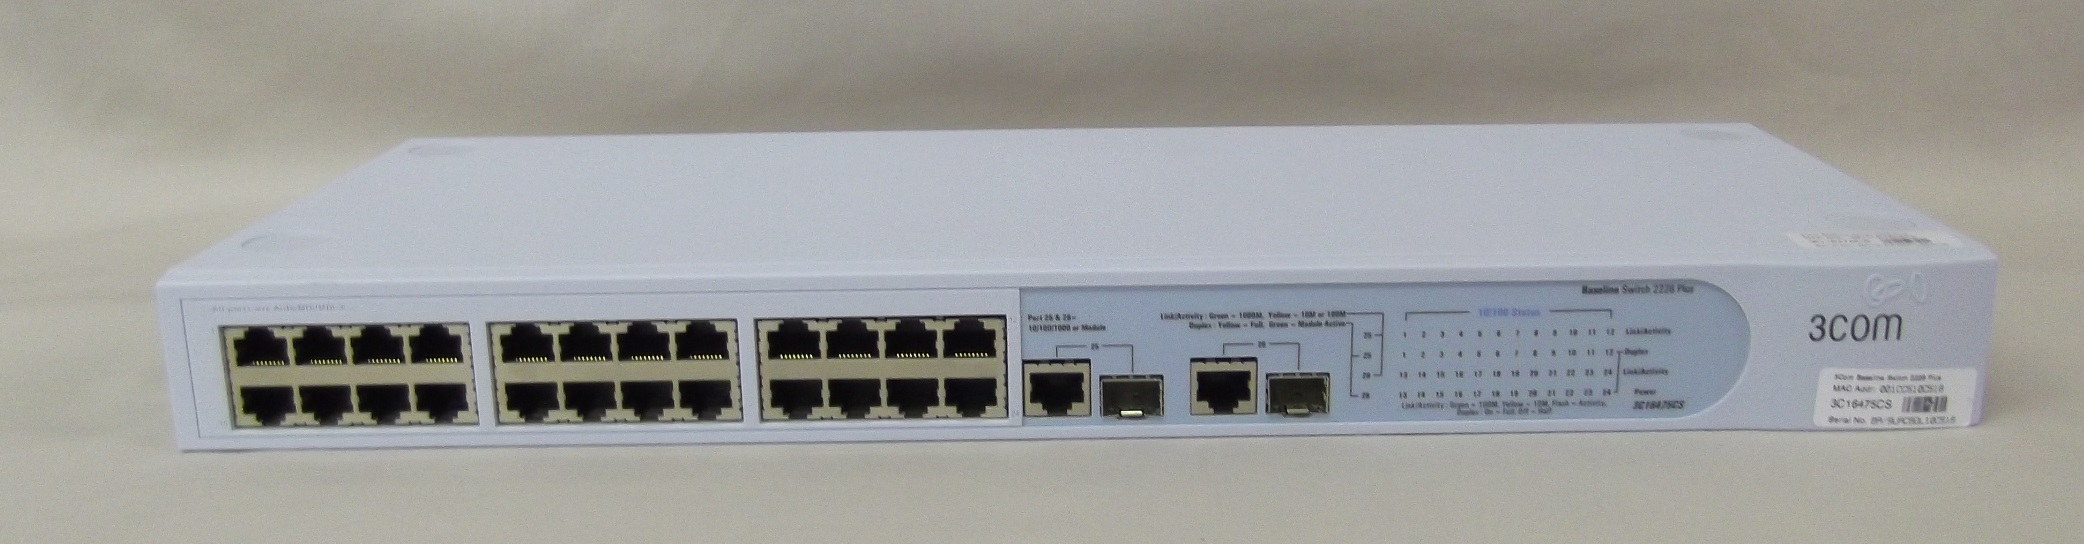 3Com Baseline 10/100 Switch 24 Port Plus 2 3C16475CS_2